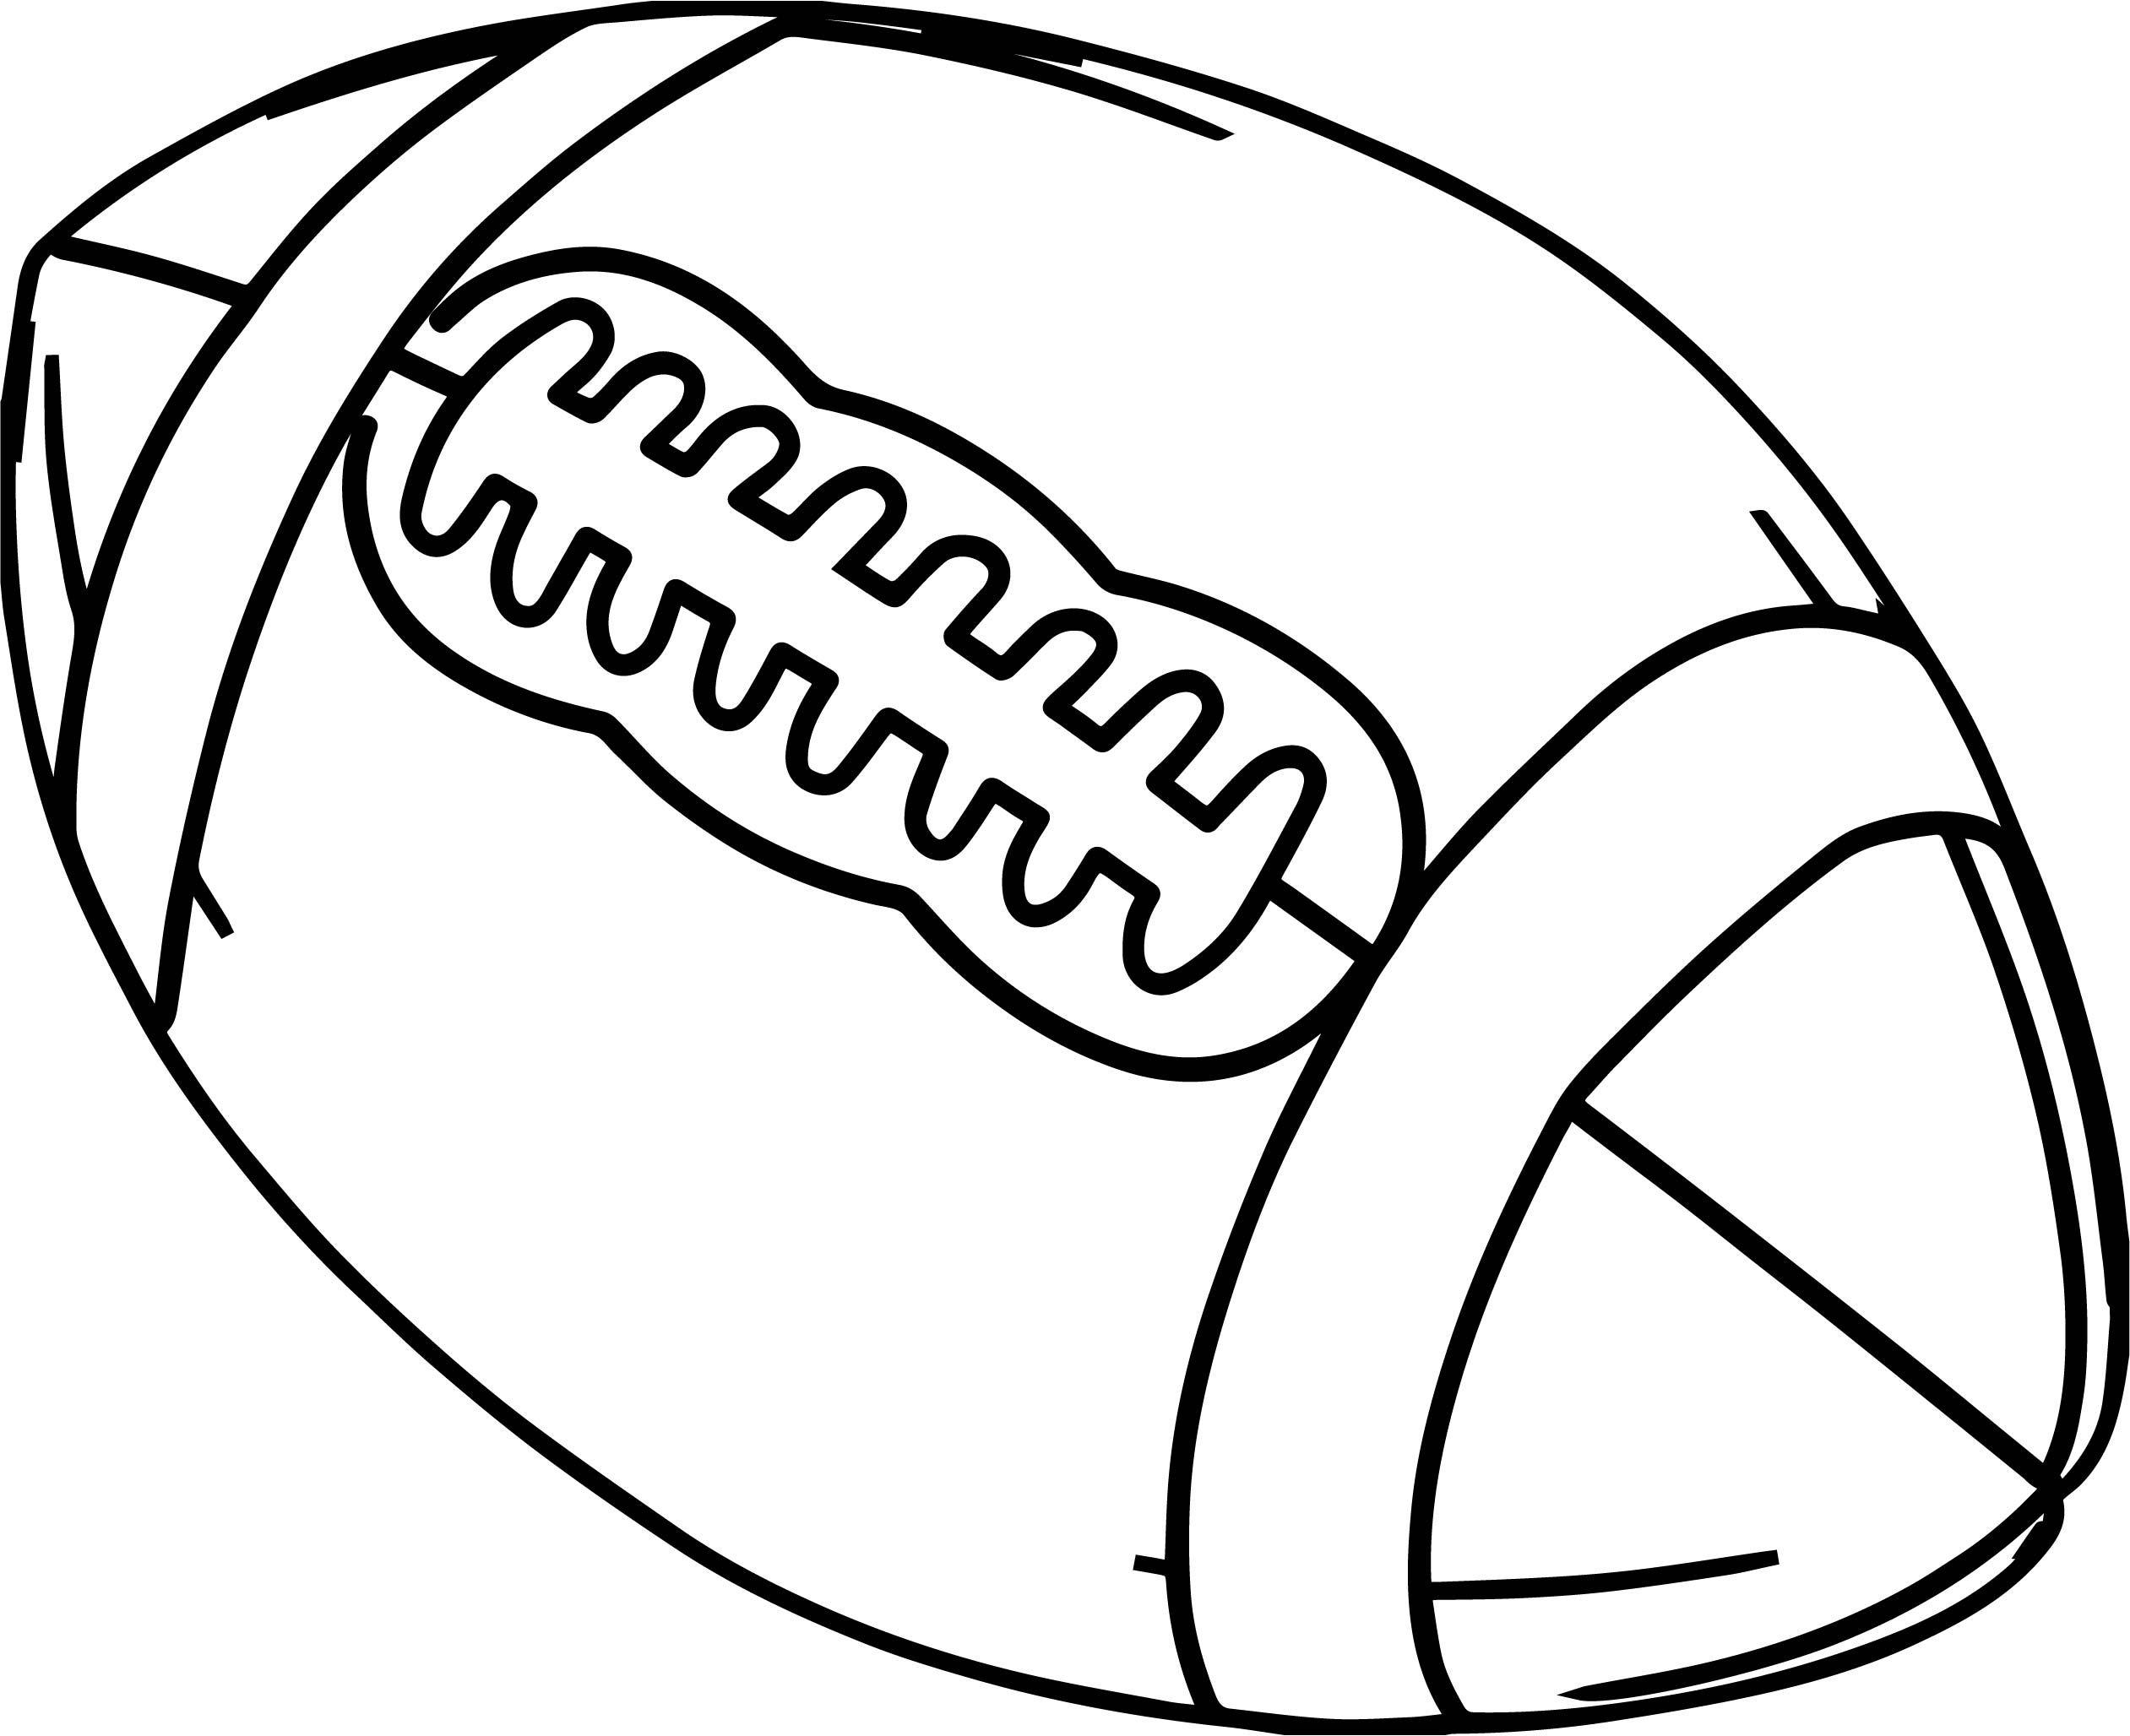 x56 alabama football ball coloring page